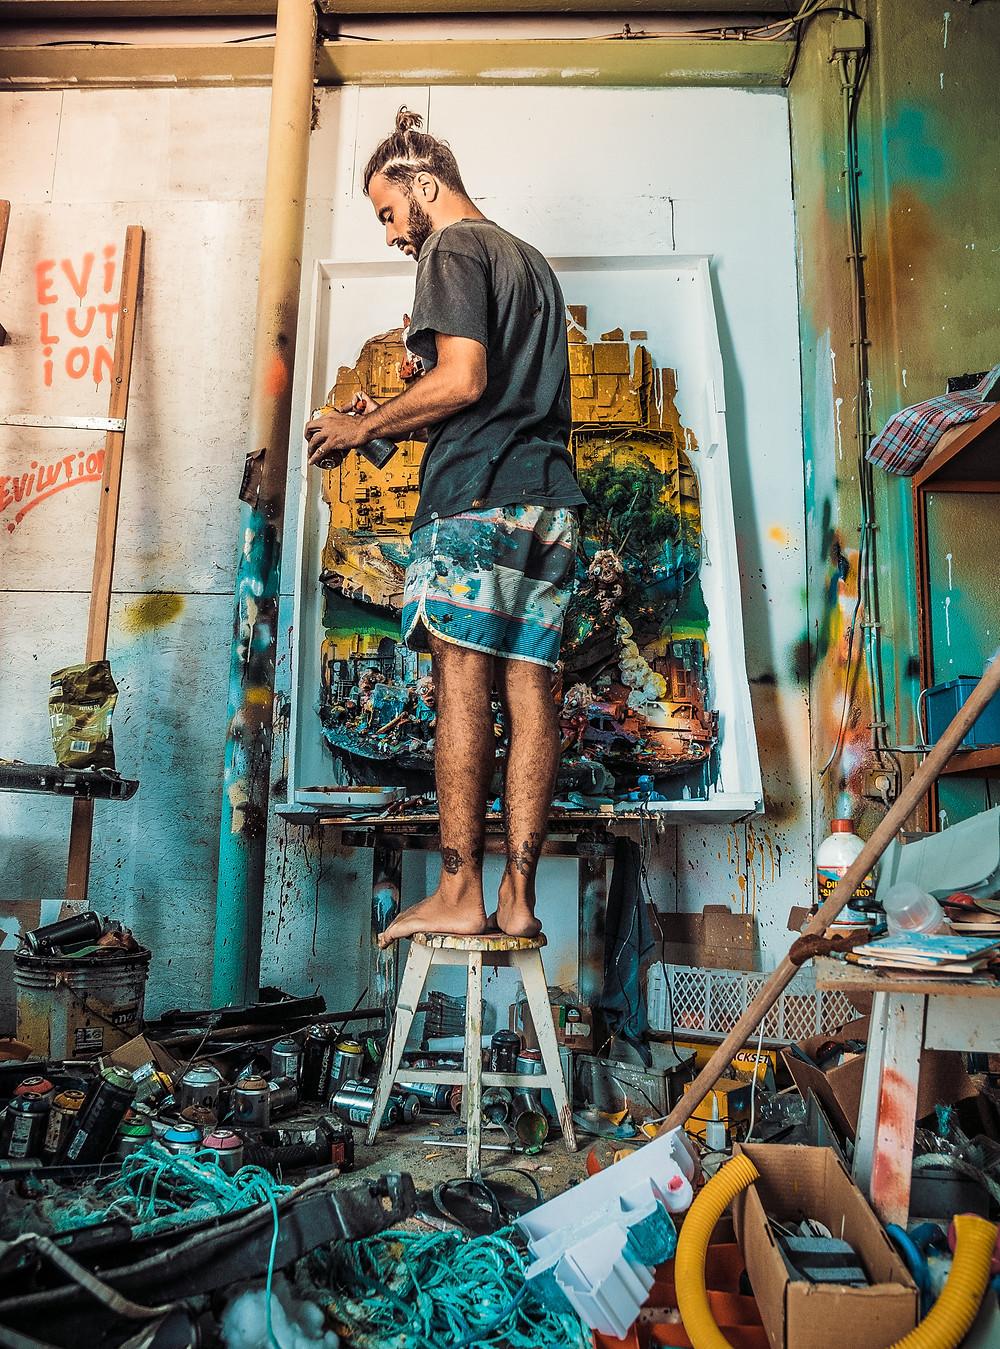 _Portrait of Bordalo II @ Lisbon Studio 2018 - photo by Miguel Portelinha